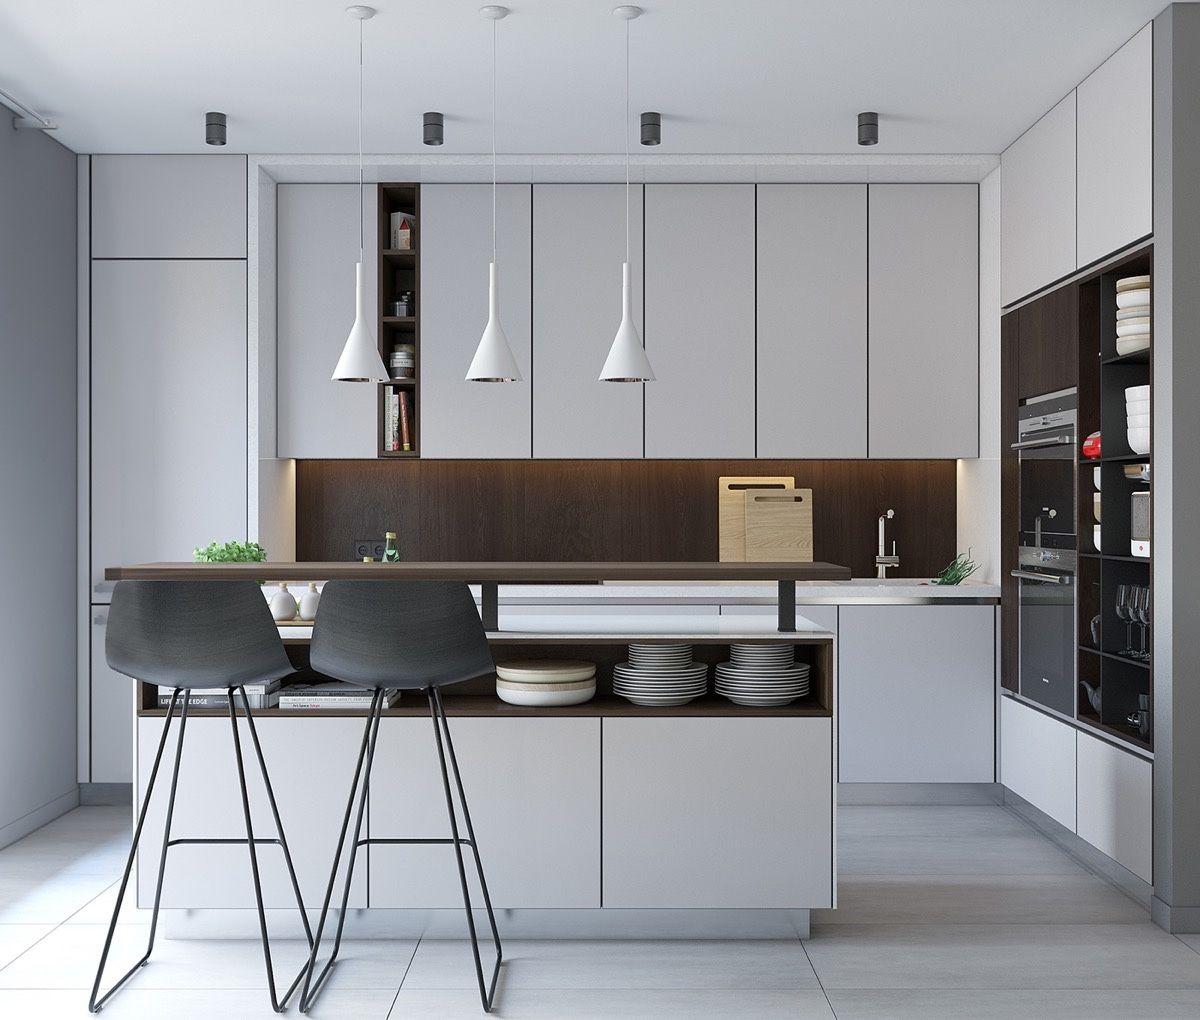 40 Minimalist Kitchens To Get Super Sleek Inspiration Moderne